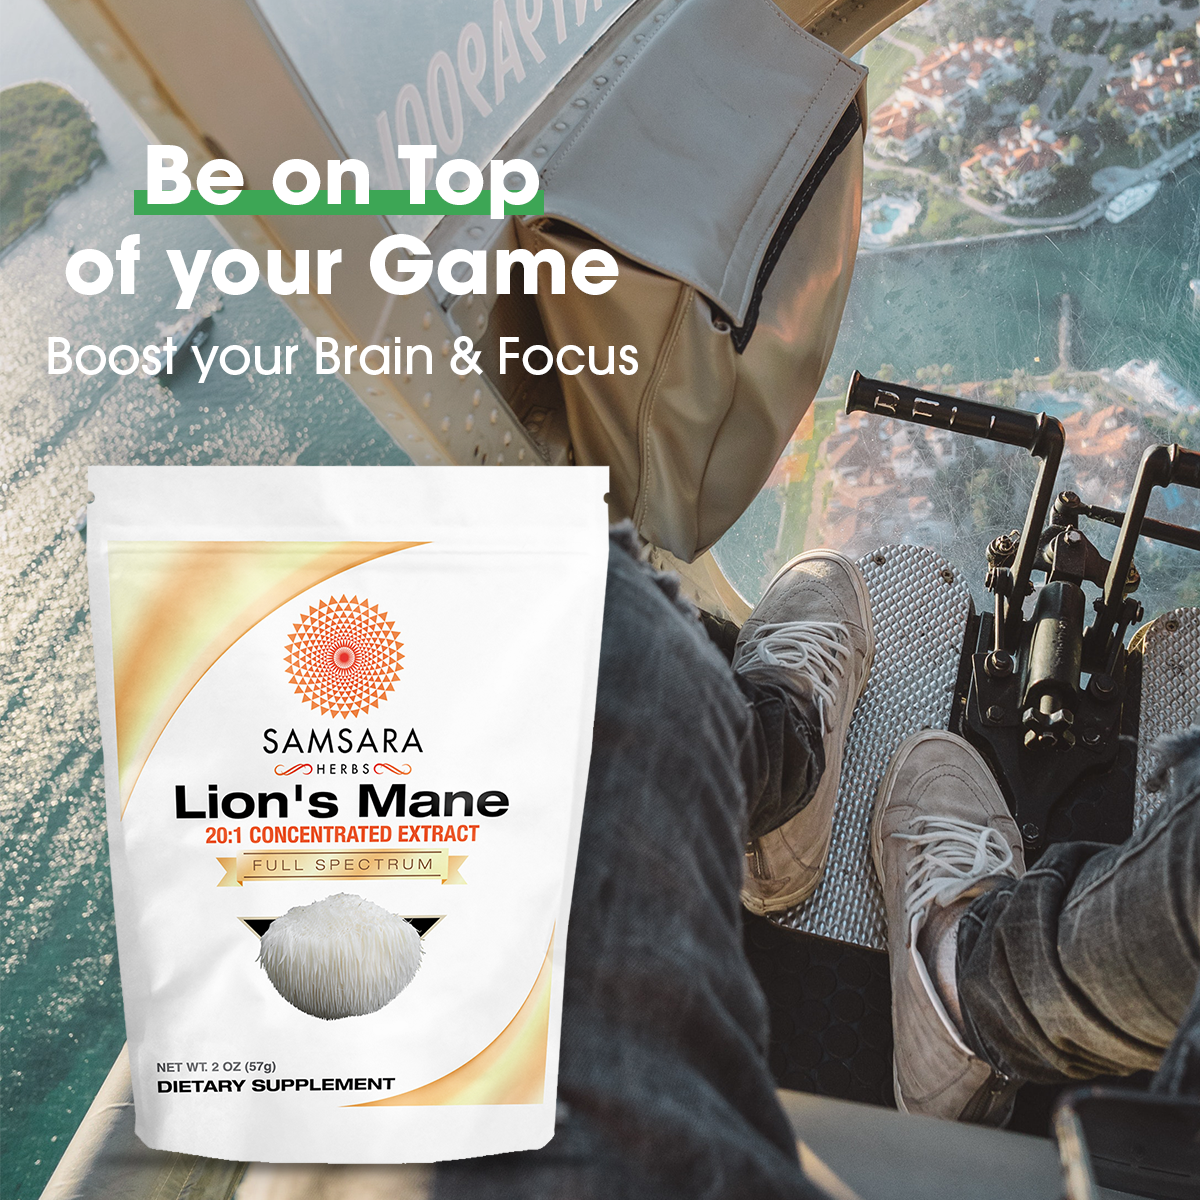 Lion's Mane Amazon Listing Images